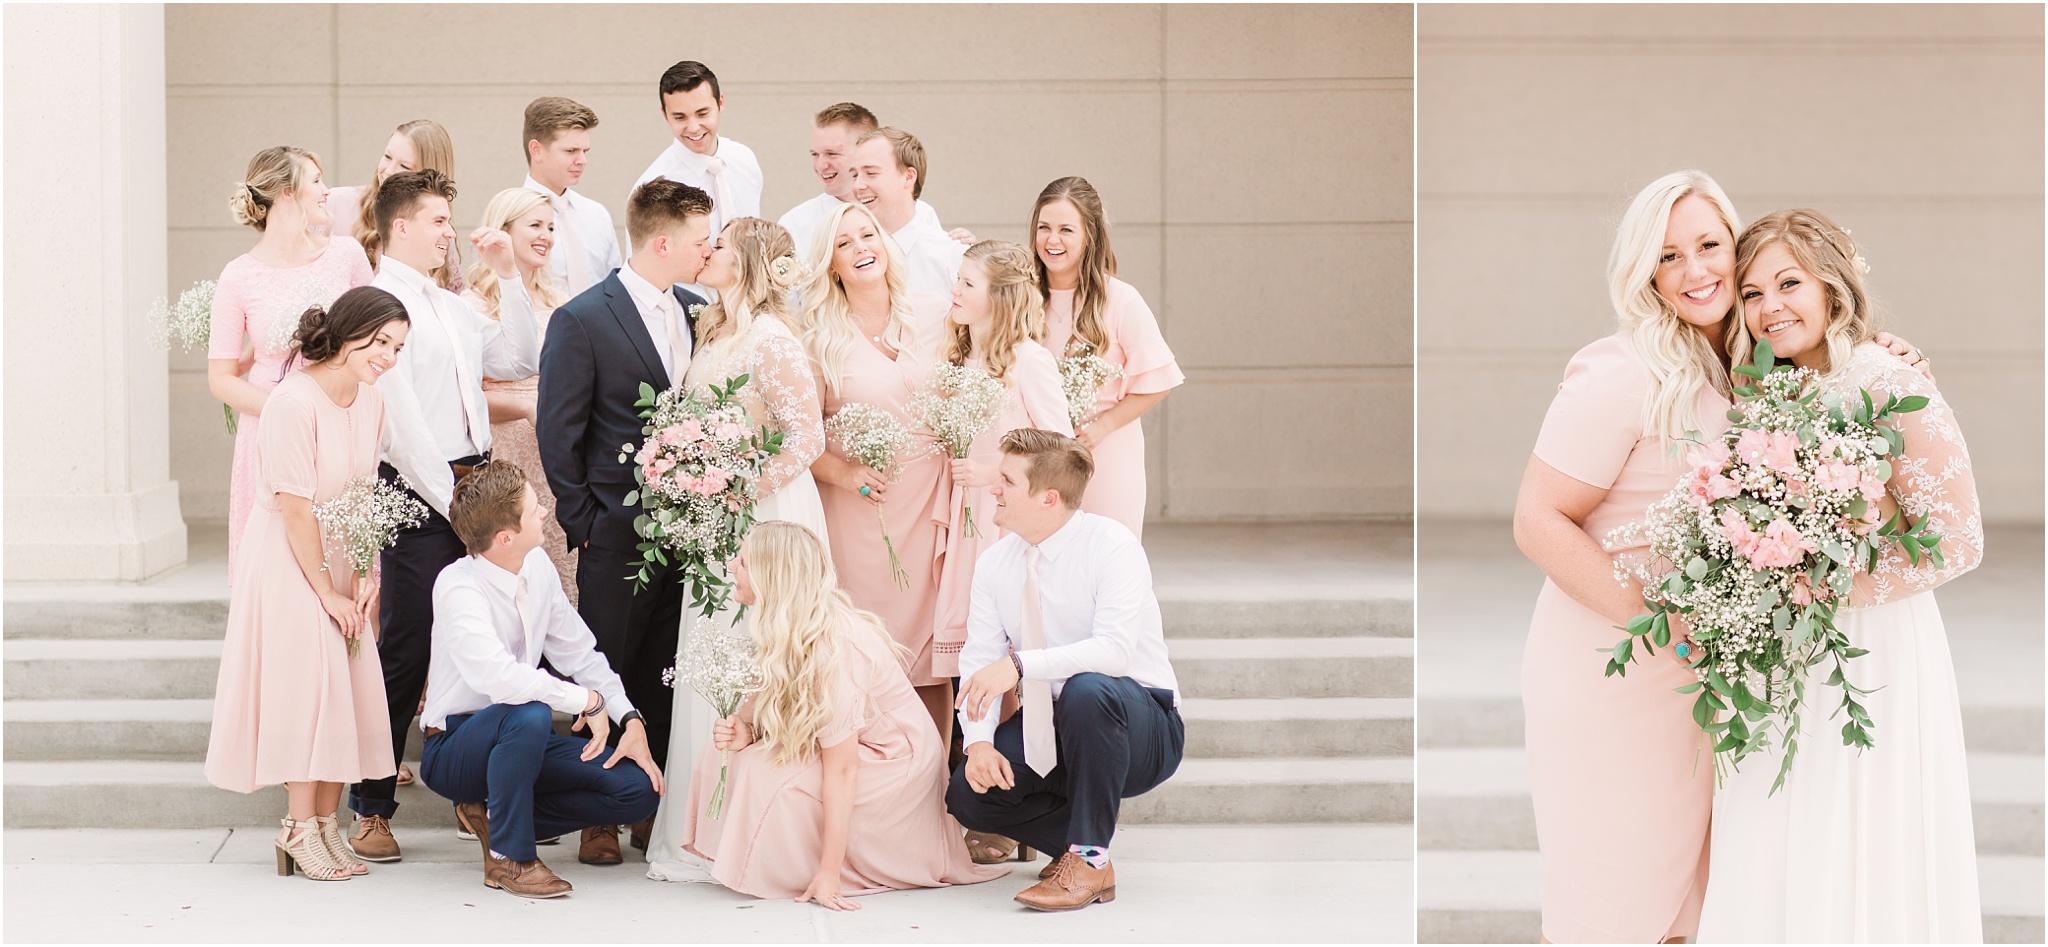 Wedding Photography_Meridian Idaho Temple_Boise Idaho_Nampa Idaho_Leah Southwick Photography_0041.jpg